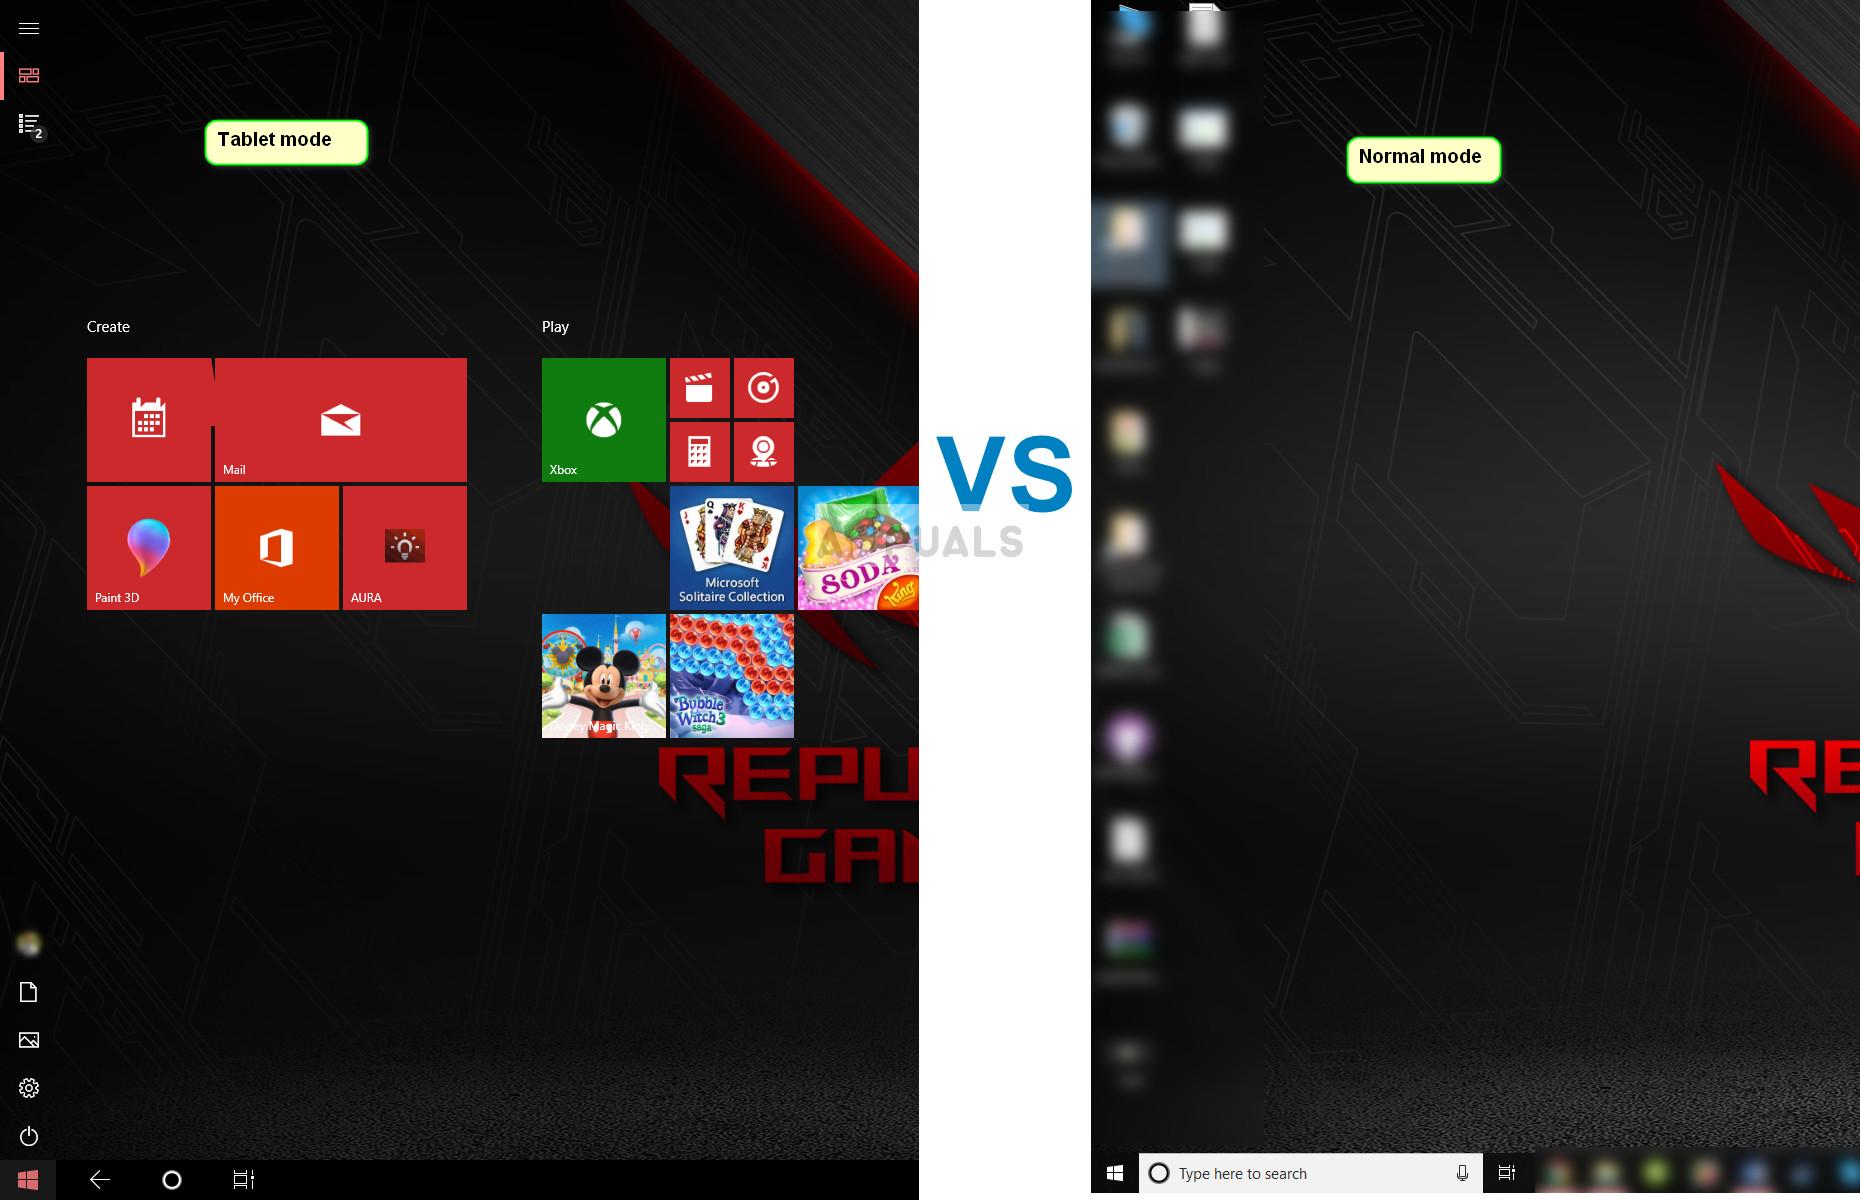 Tablet mode vs Normal mode in Windows 10